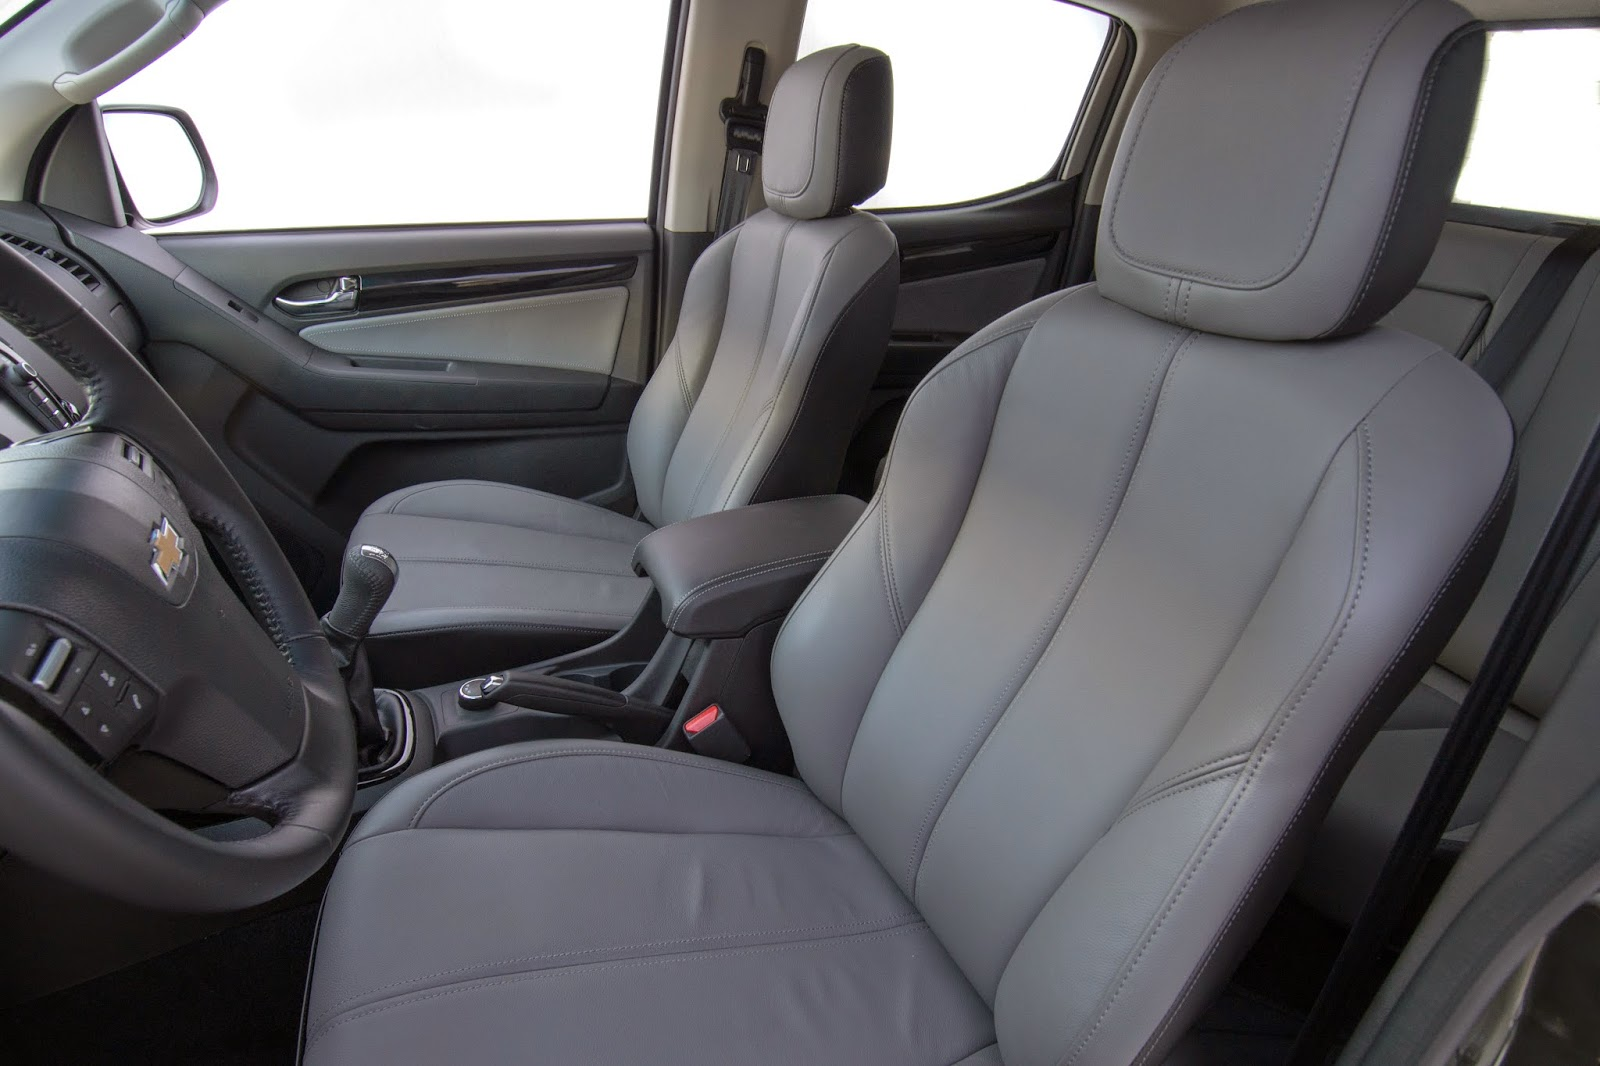 S10 2015 COM MOTOR 2.5 FLEX DE 206CV